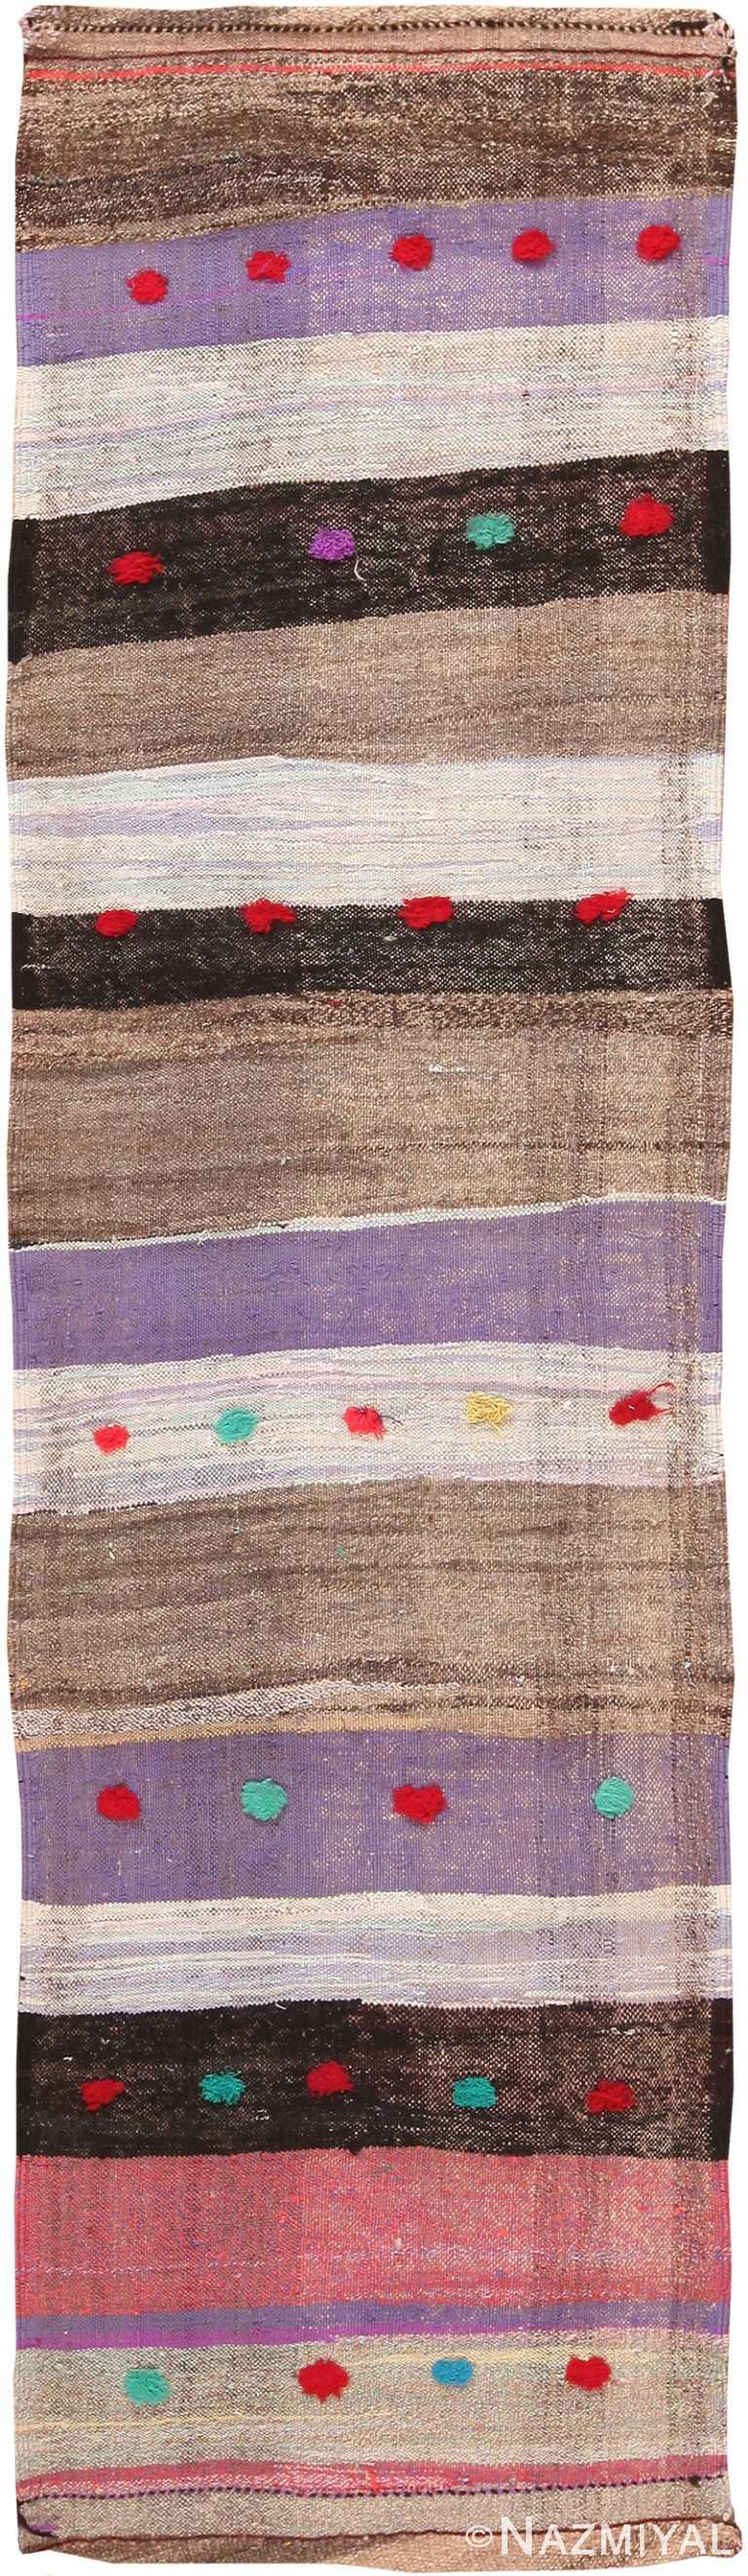 Colorful Vintage Persian Kilim Runner Rug 60369 by Nazmiyal NYC